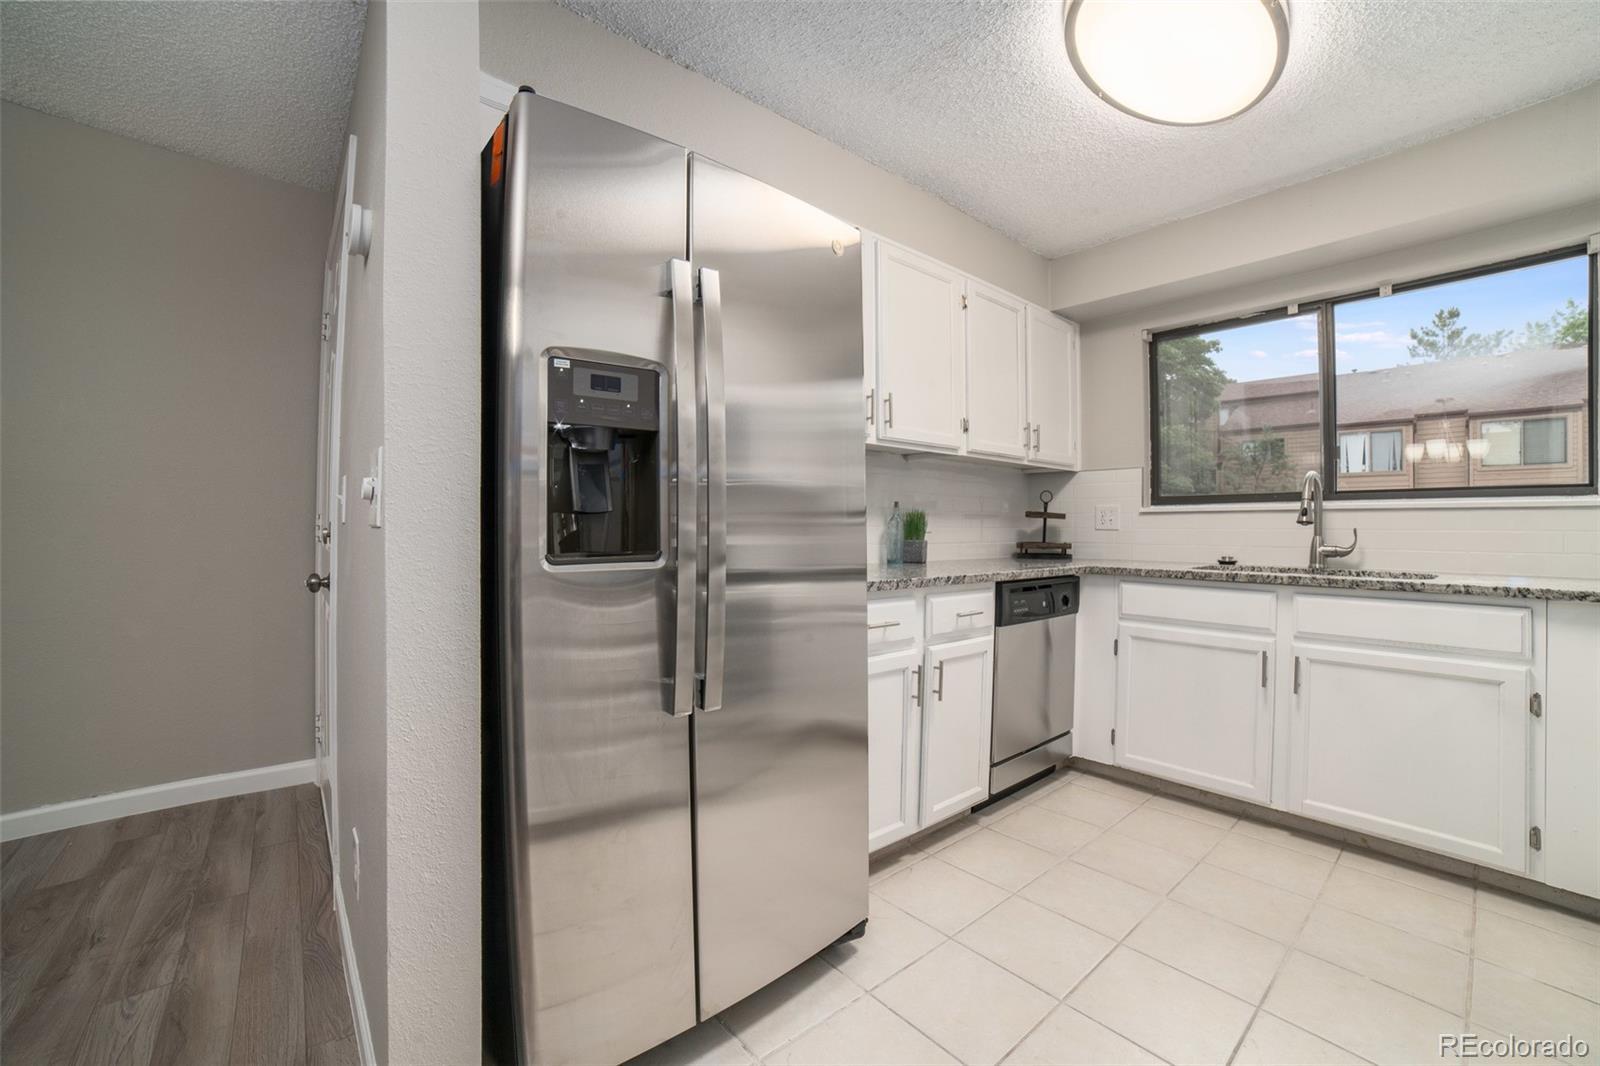 MLS# 8386467 - 8 - 220 Wright Street #203, Lakewood, CO 80228